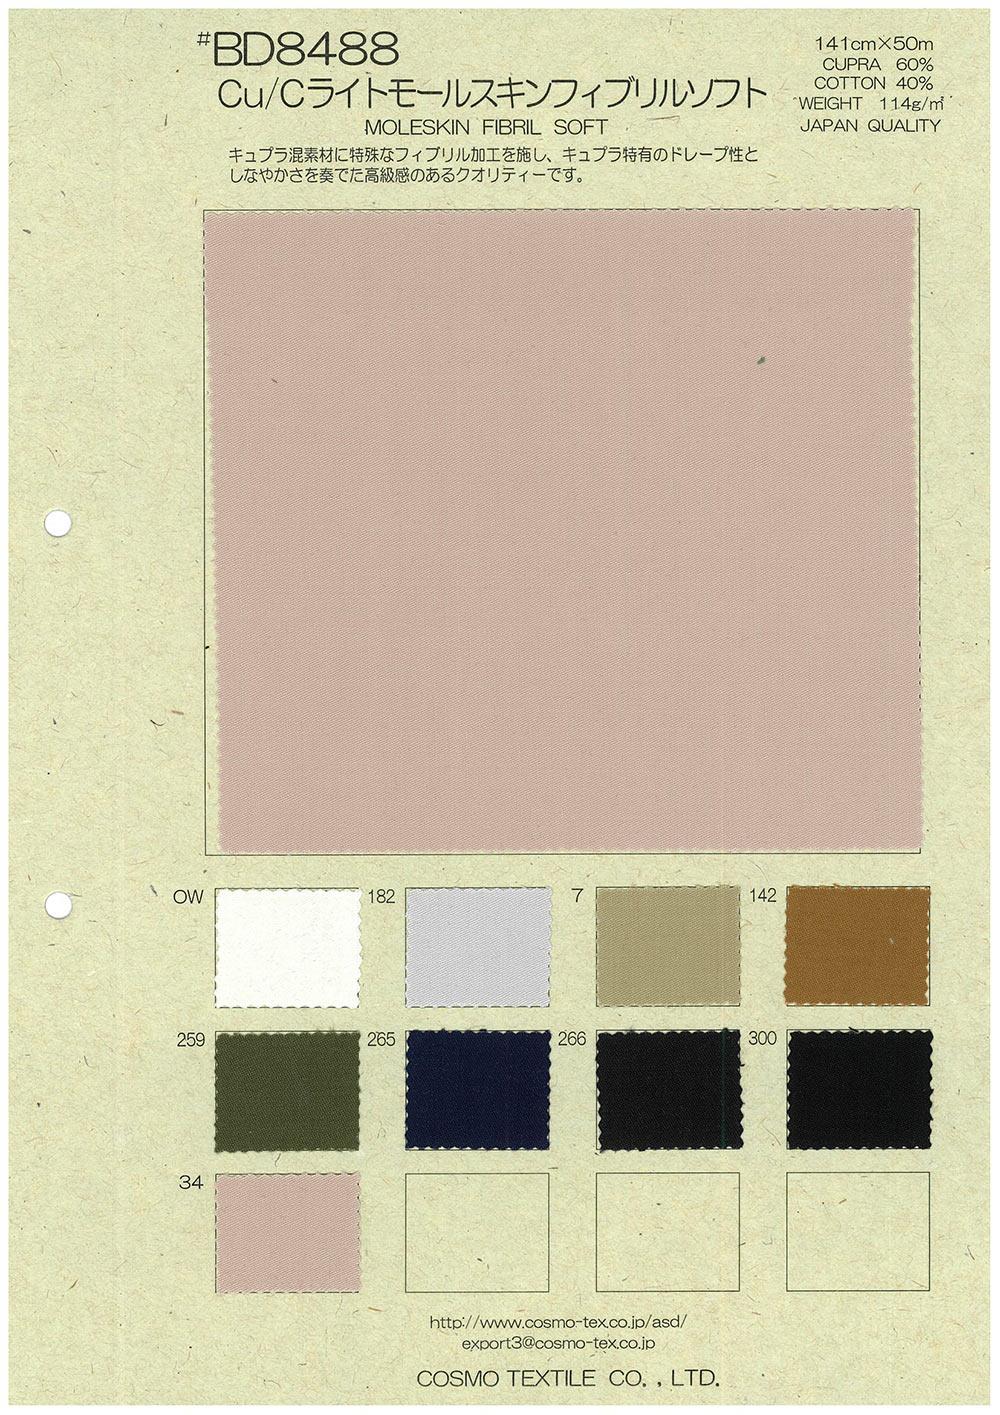 BD8488 C/CUライトモールスキン[生地] コスモテキスタイル/オークラ商事 - ApparelX アパレル資材卸通販